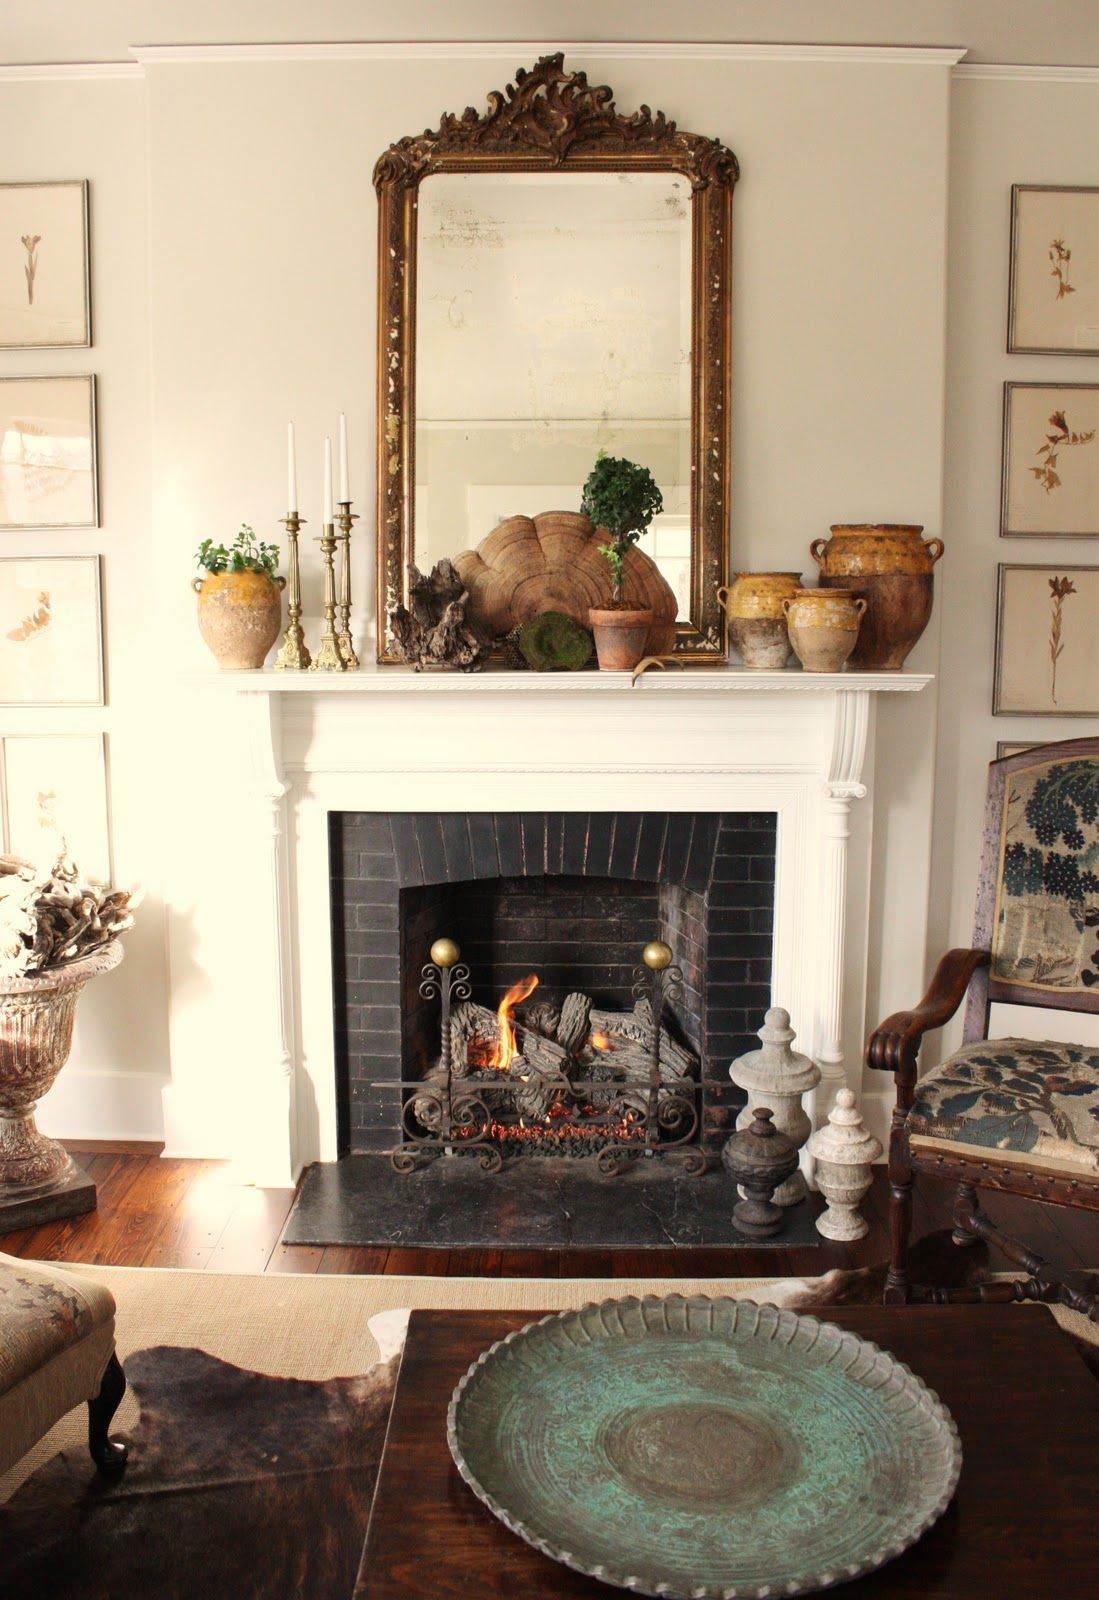 15 Stylish Winter Mantels Decor Home Decor Fireplace Mantle